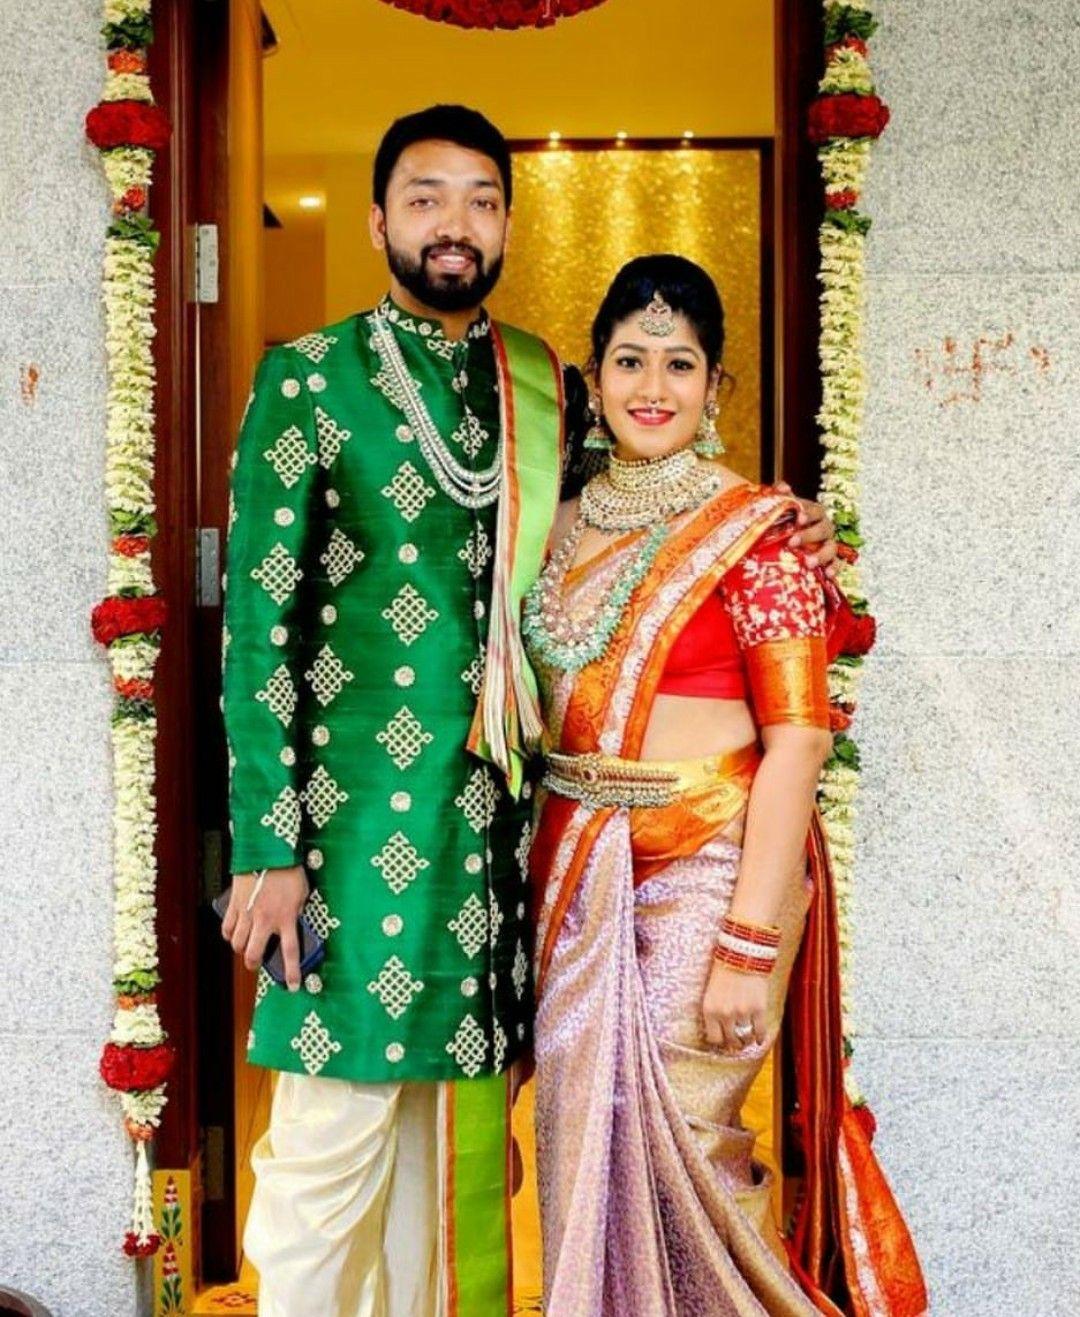 Pin By Priyanka Kolla On Lovely Couples